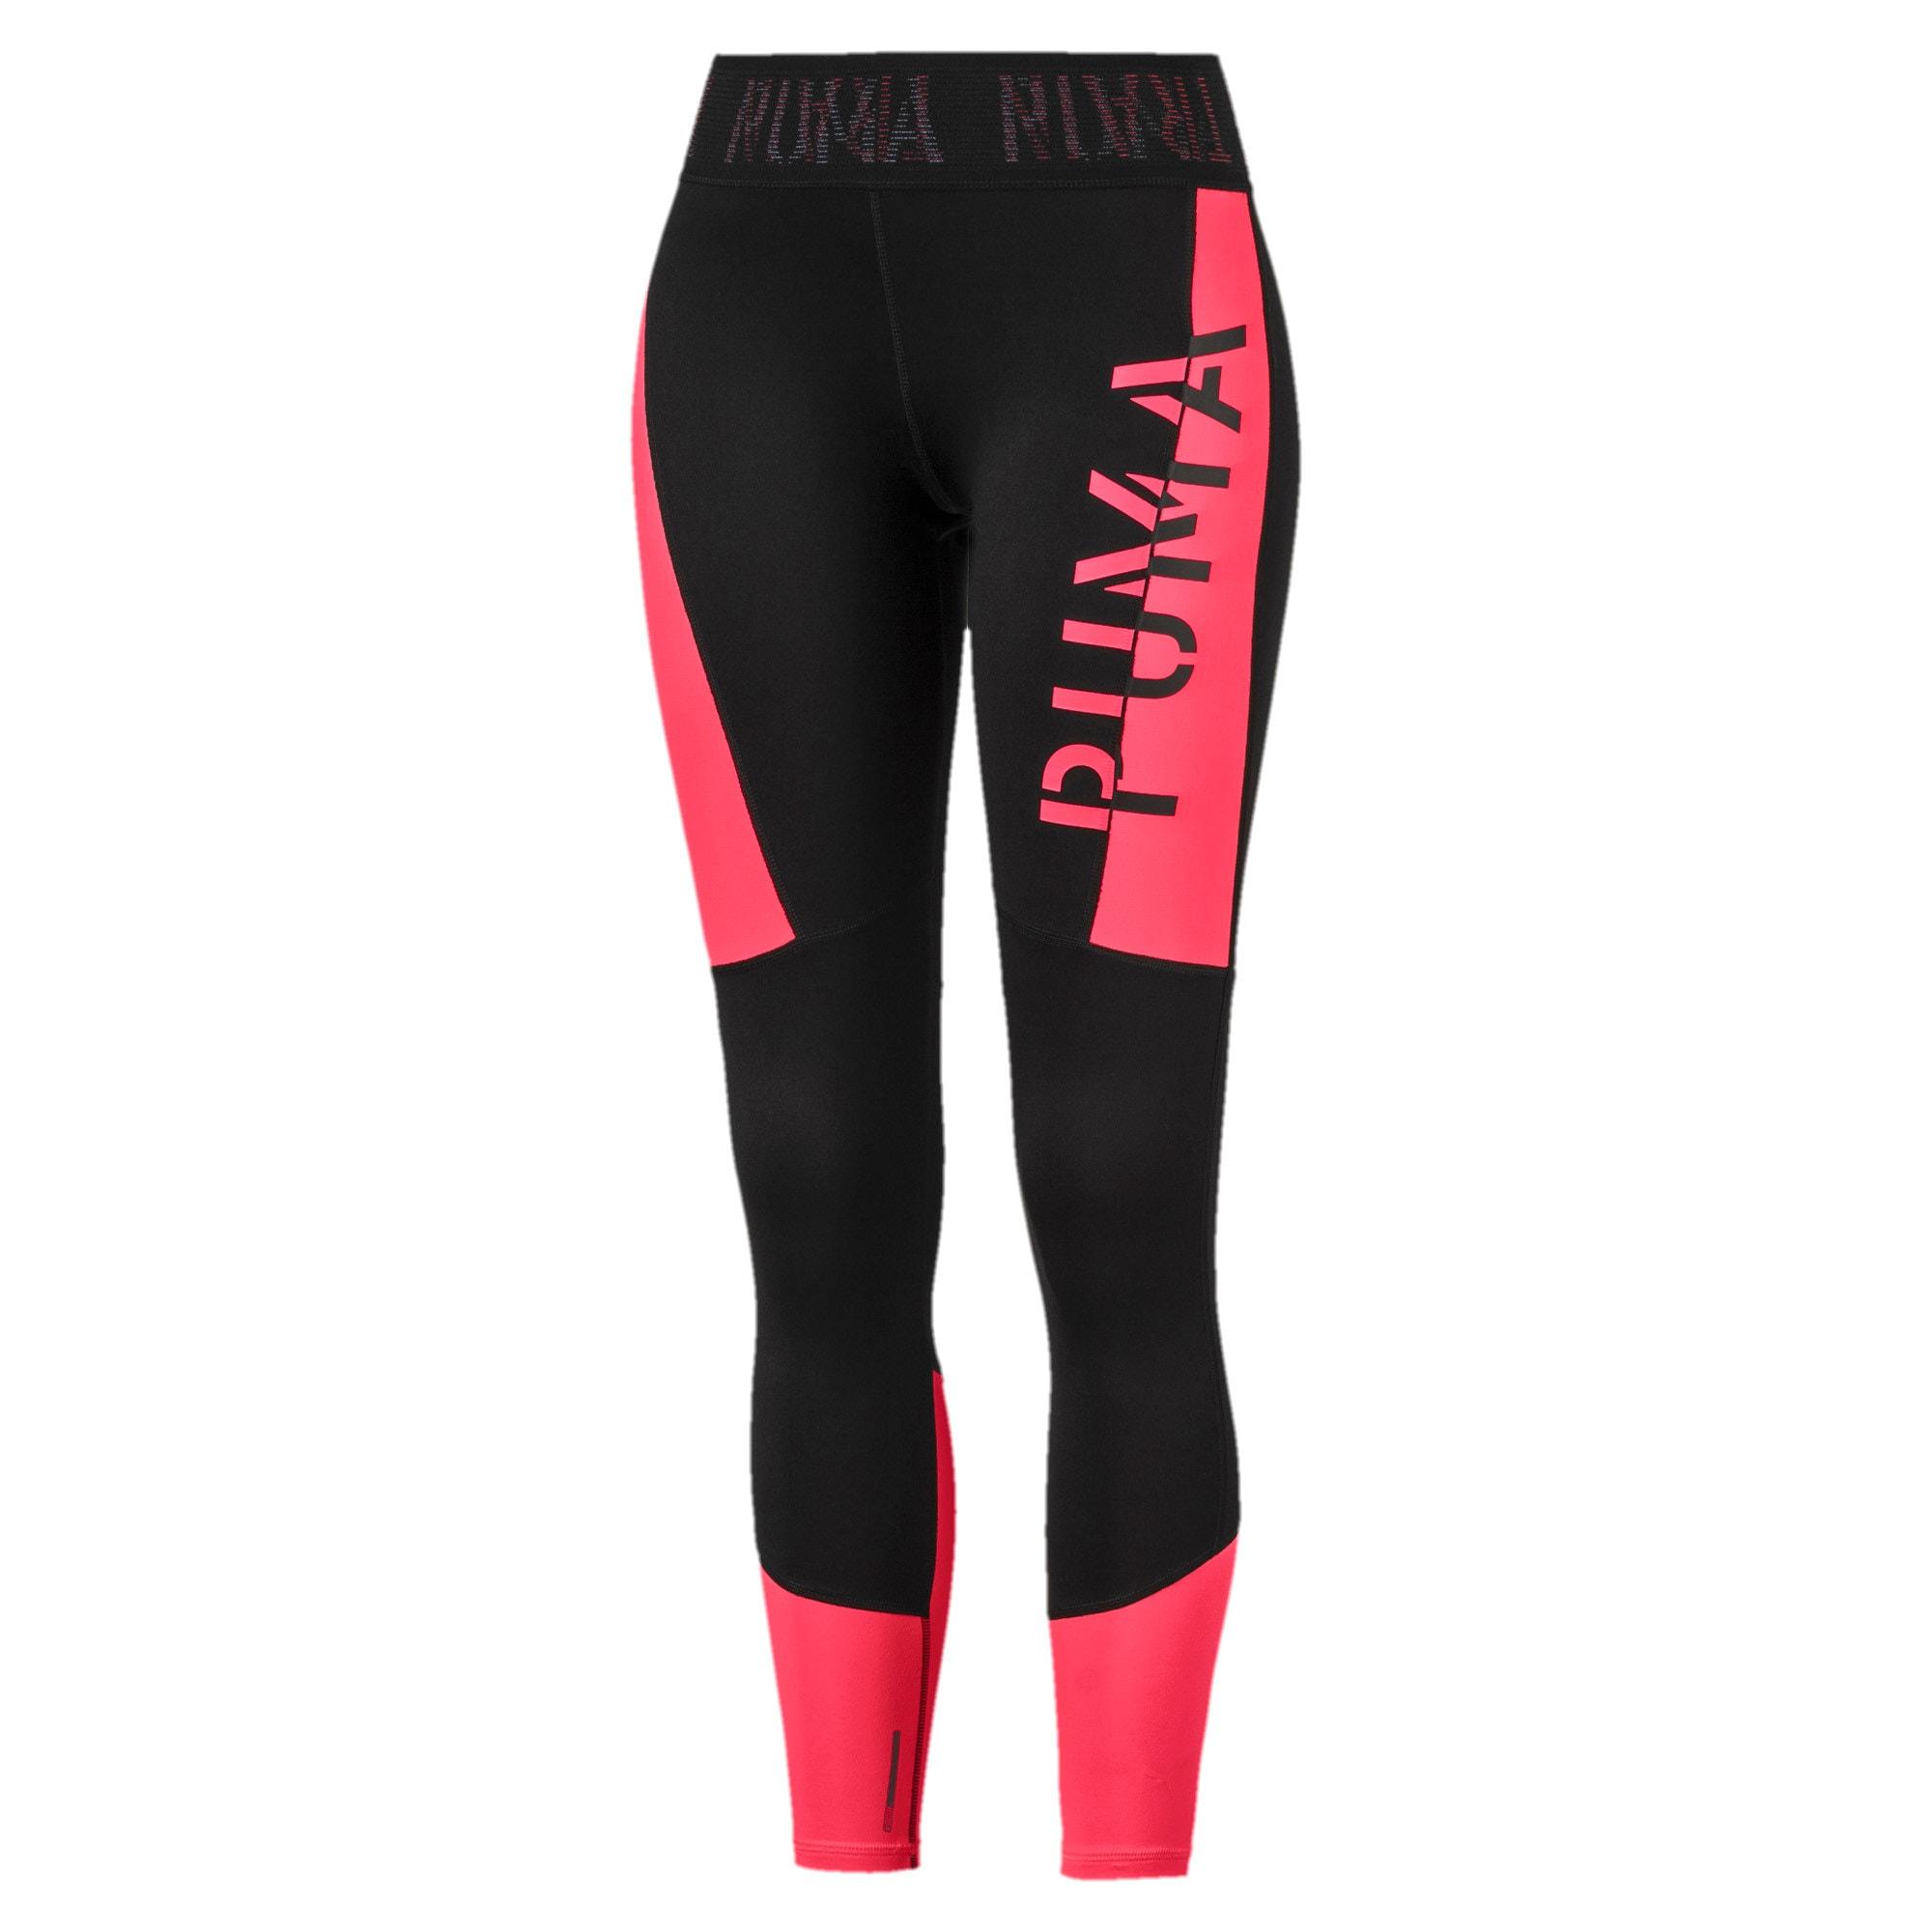 Thumbnail 4 of Logo Women's 7/8 Leggings, Puma Black-Pink Alert, medium